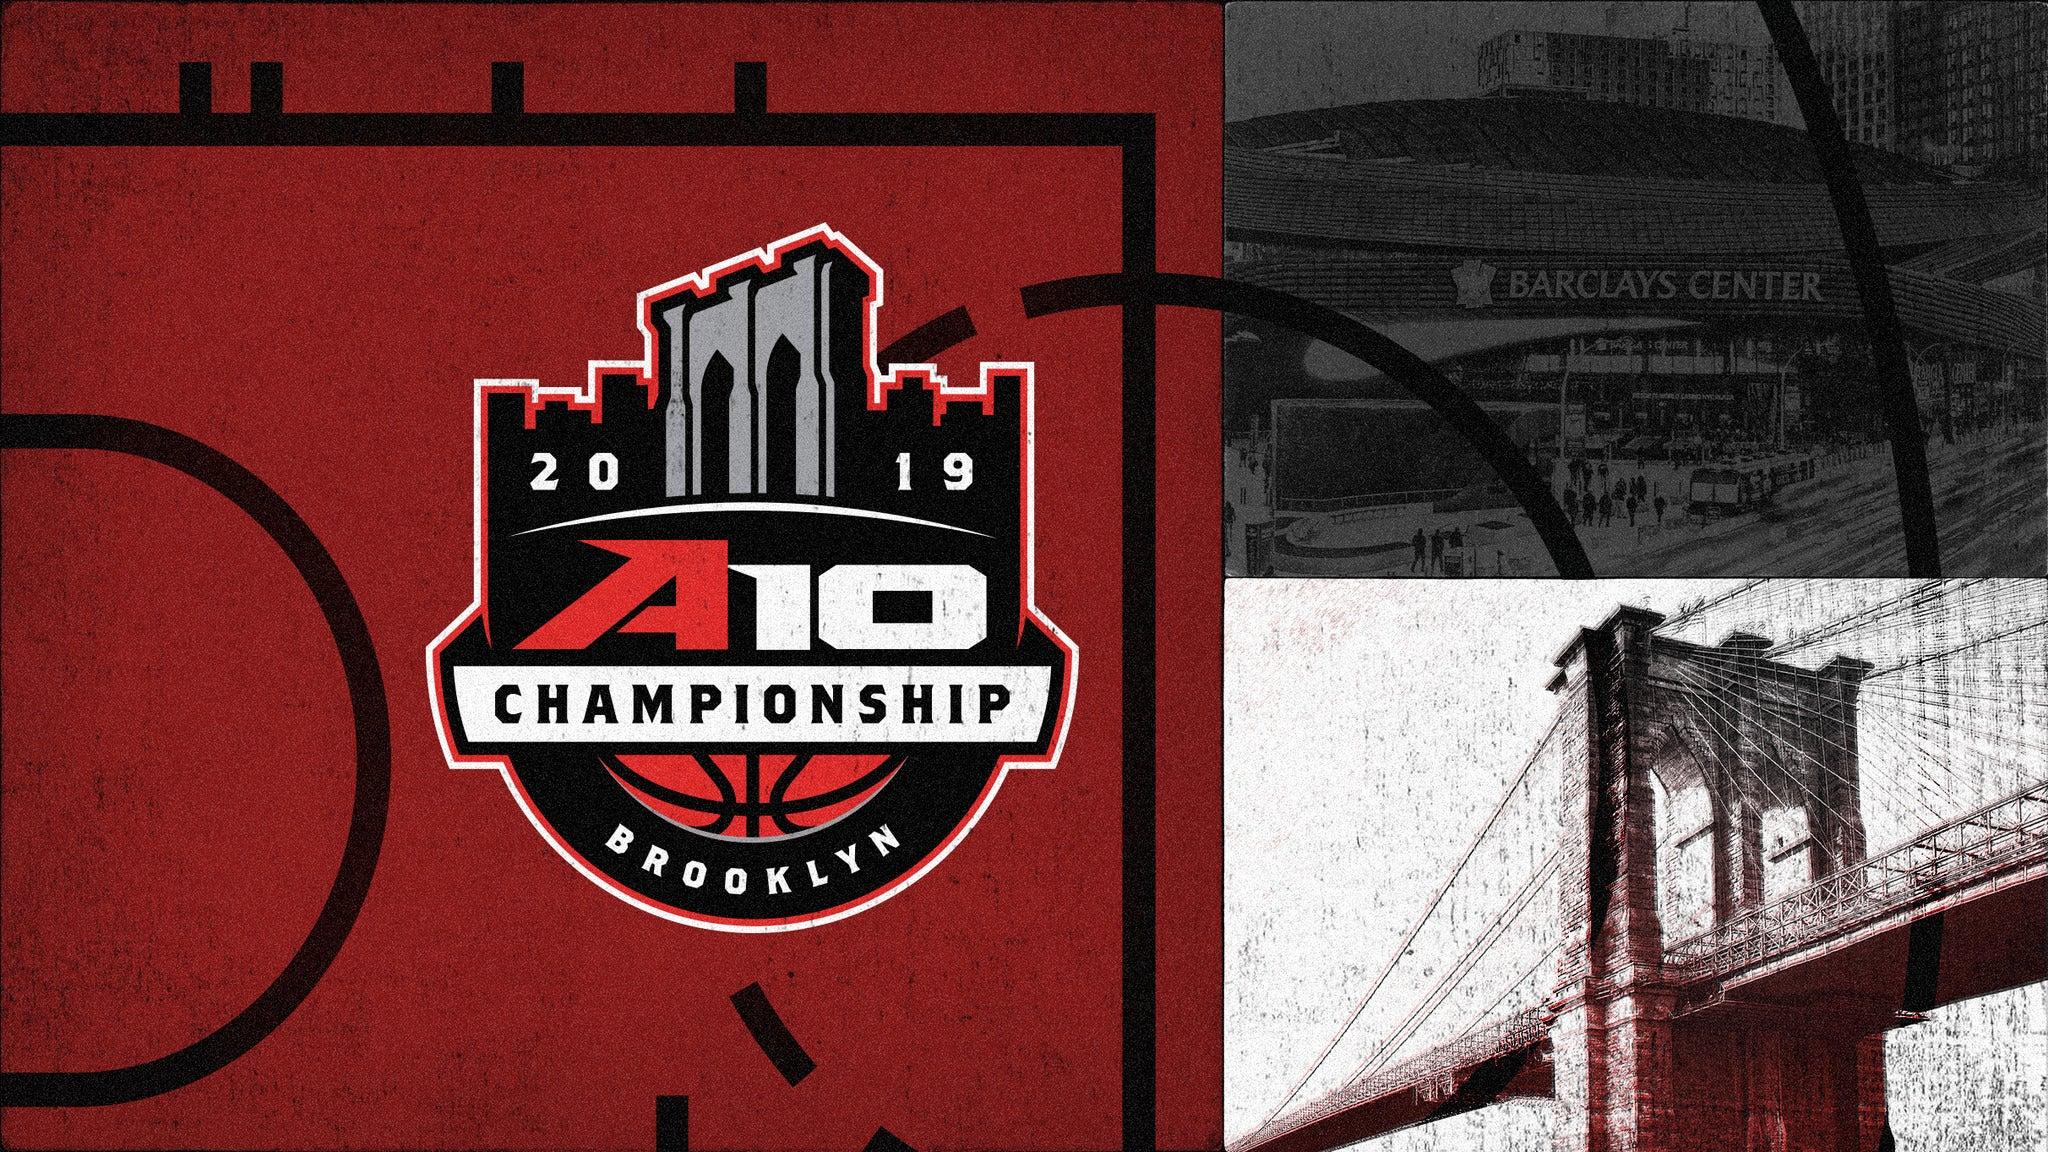 2019 Atlantic 10 Championship - All-Session